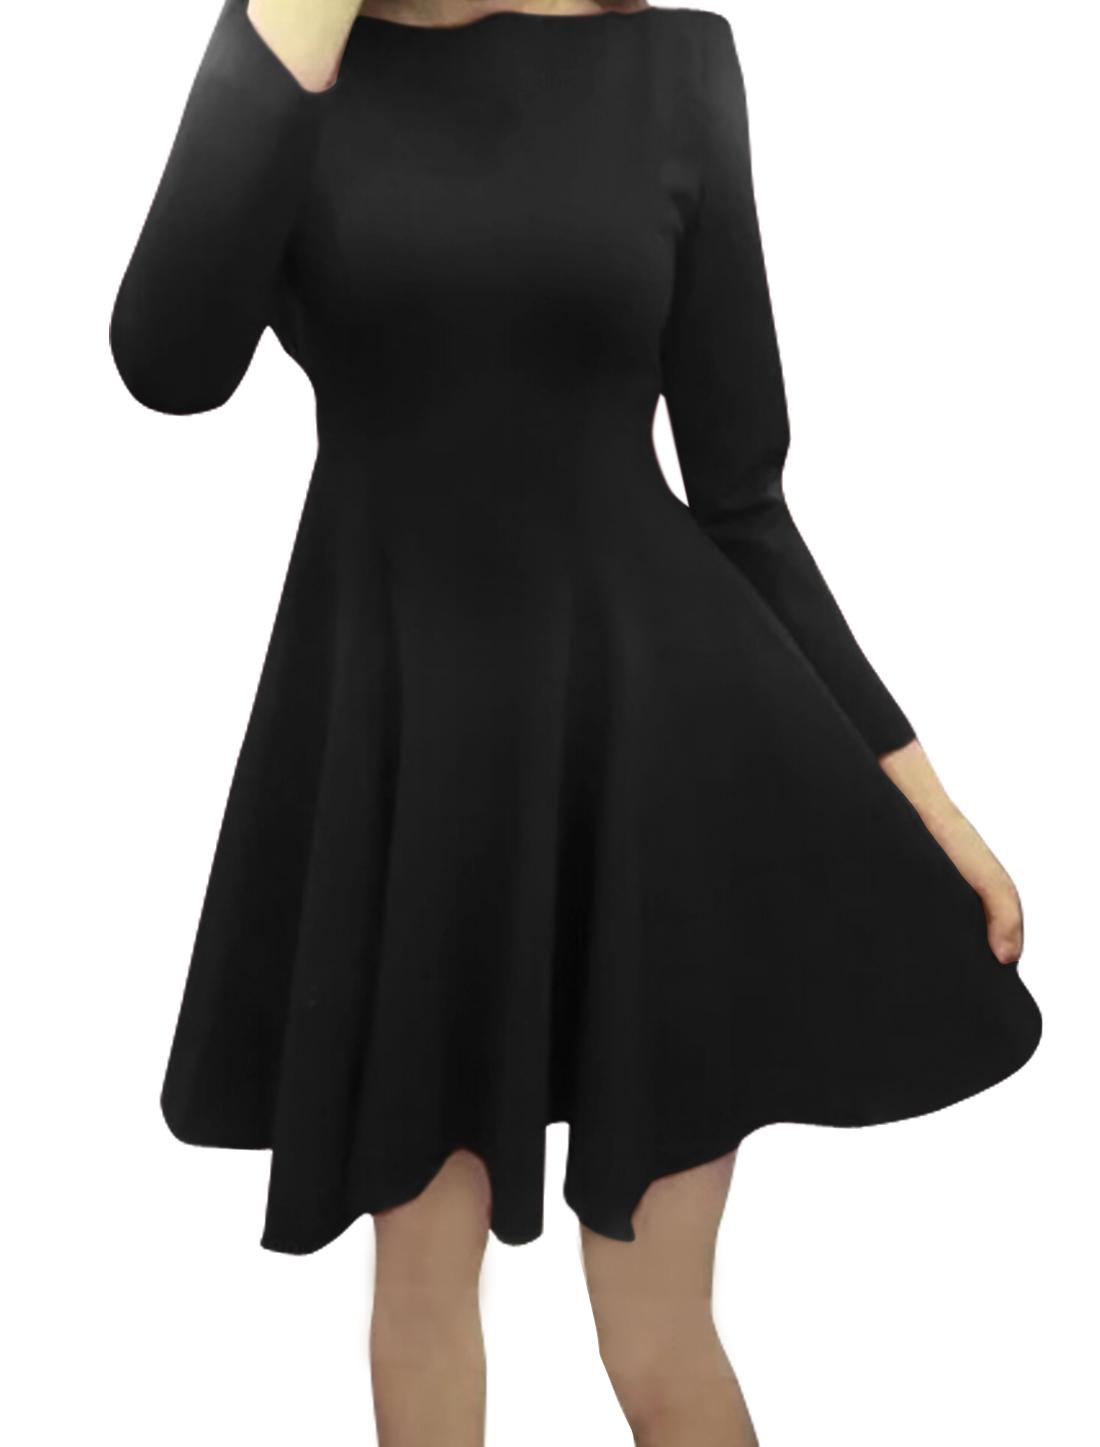 Lady Round Neck Bracelet Sleeves Padded Shoulders Flared Short Dress Black S